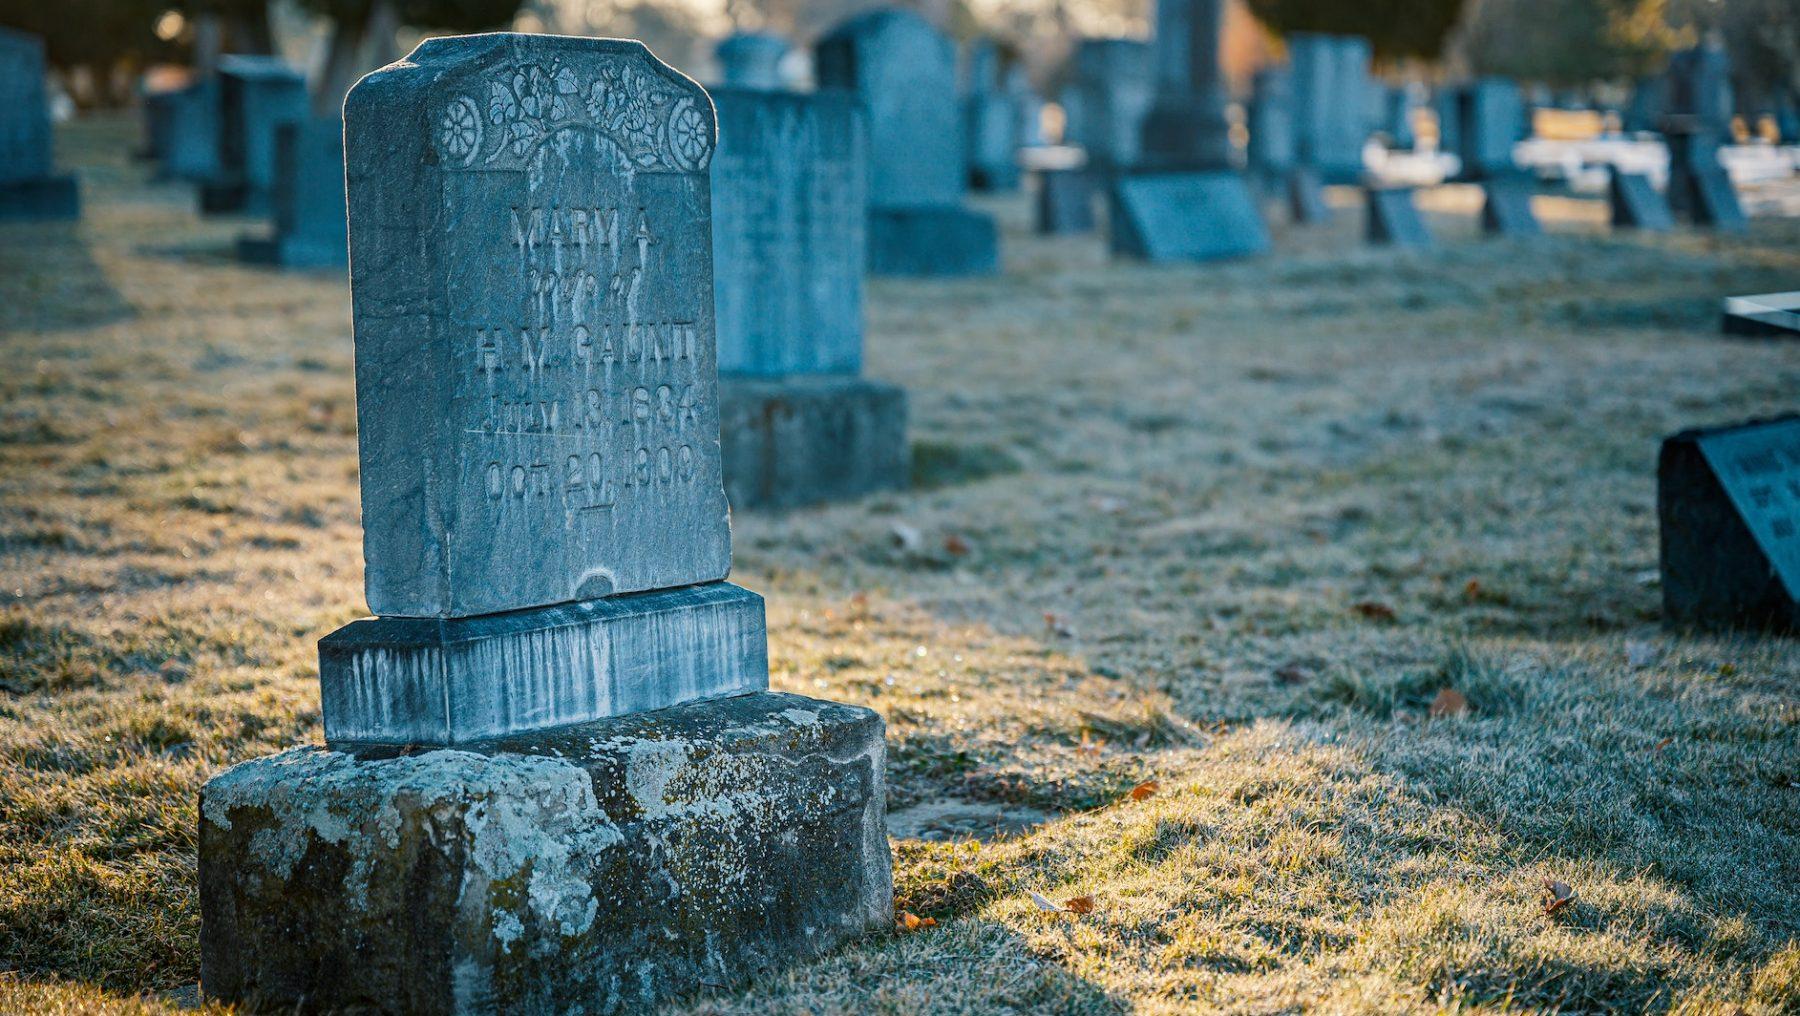 wipeout overleden amerika hartaanval programma endemol